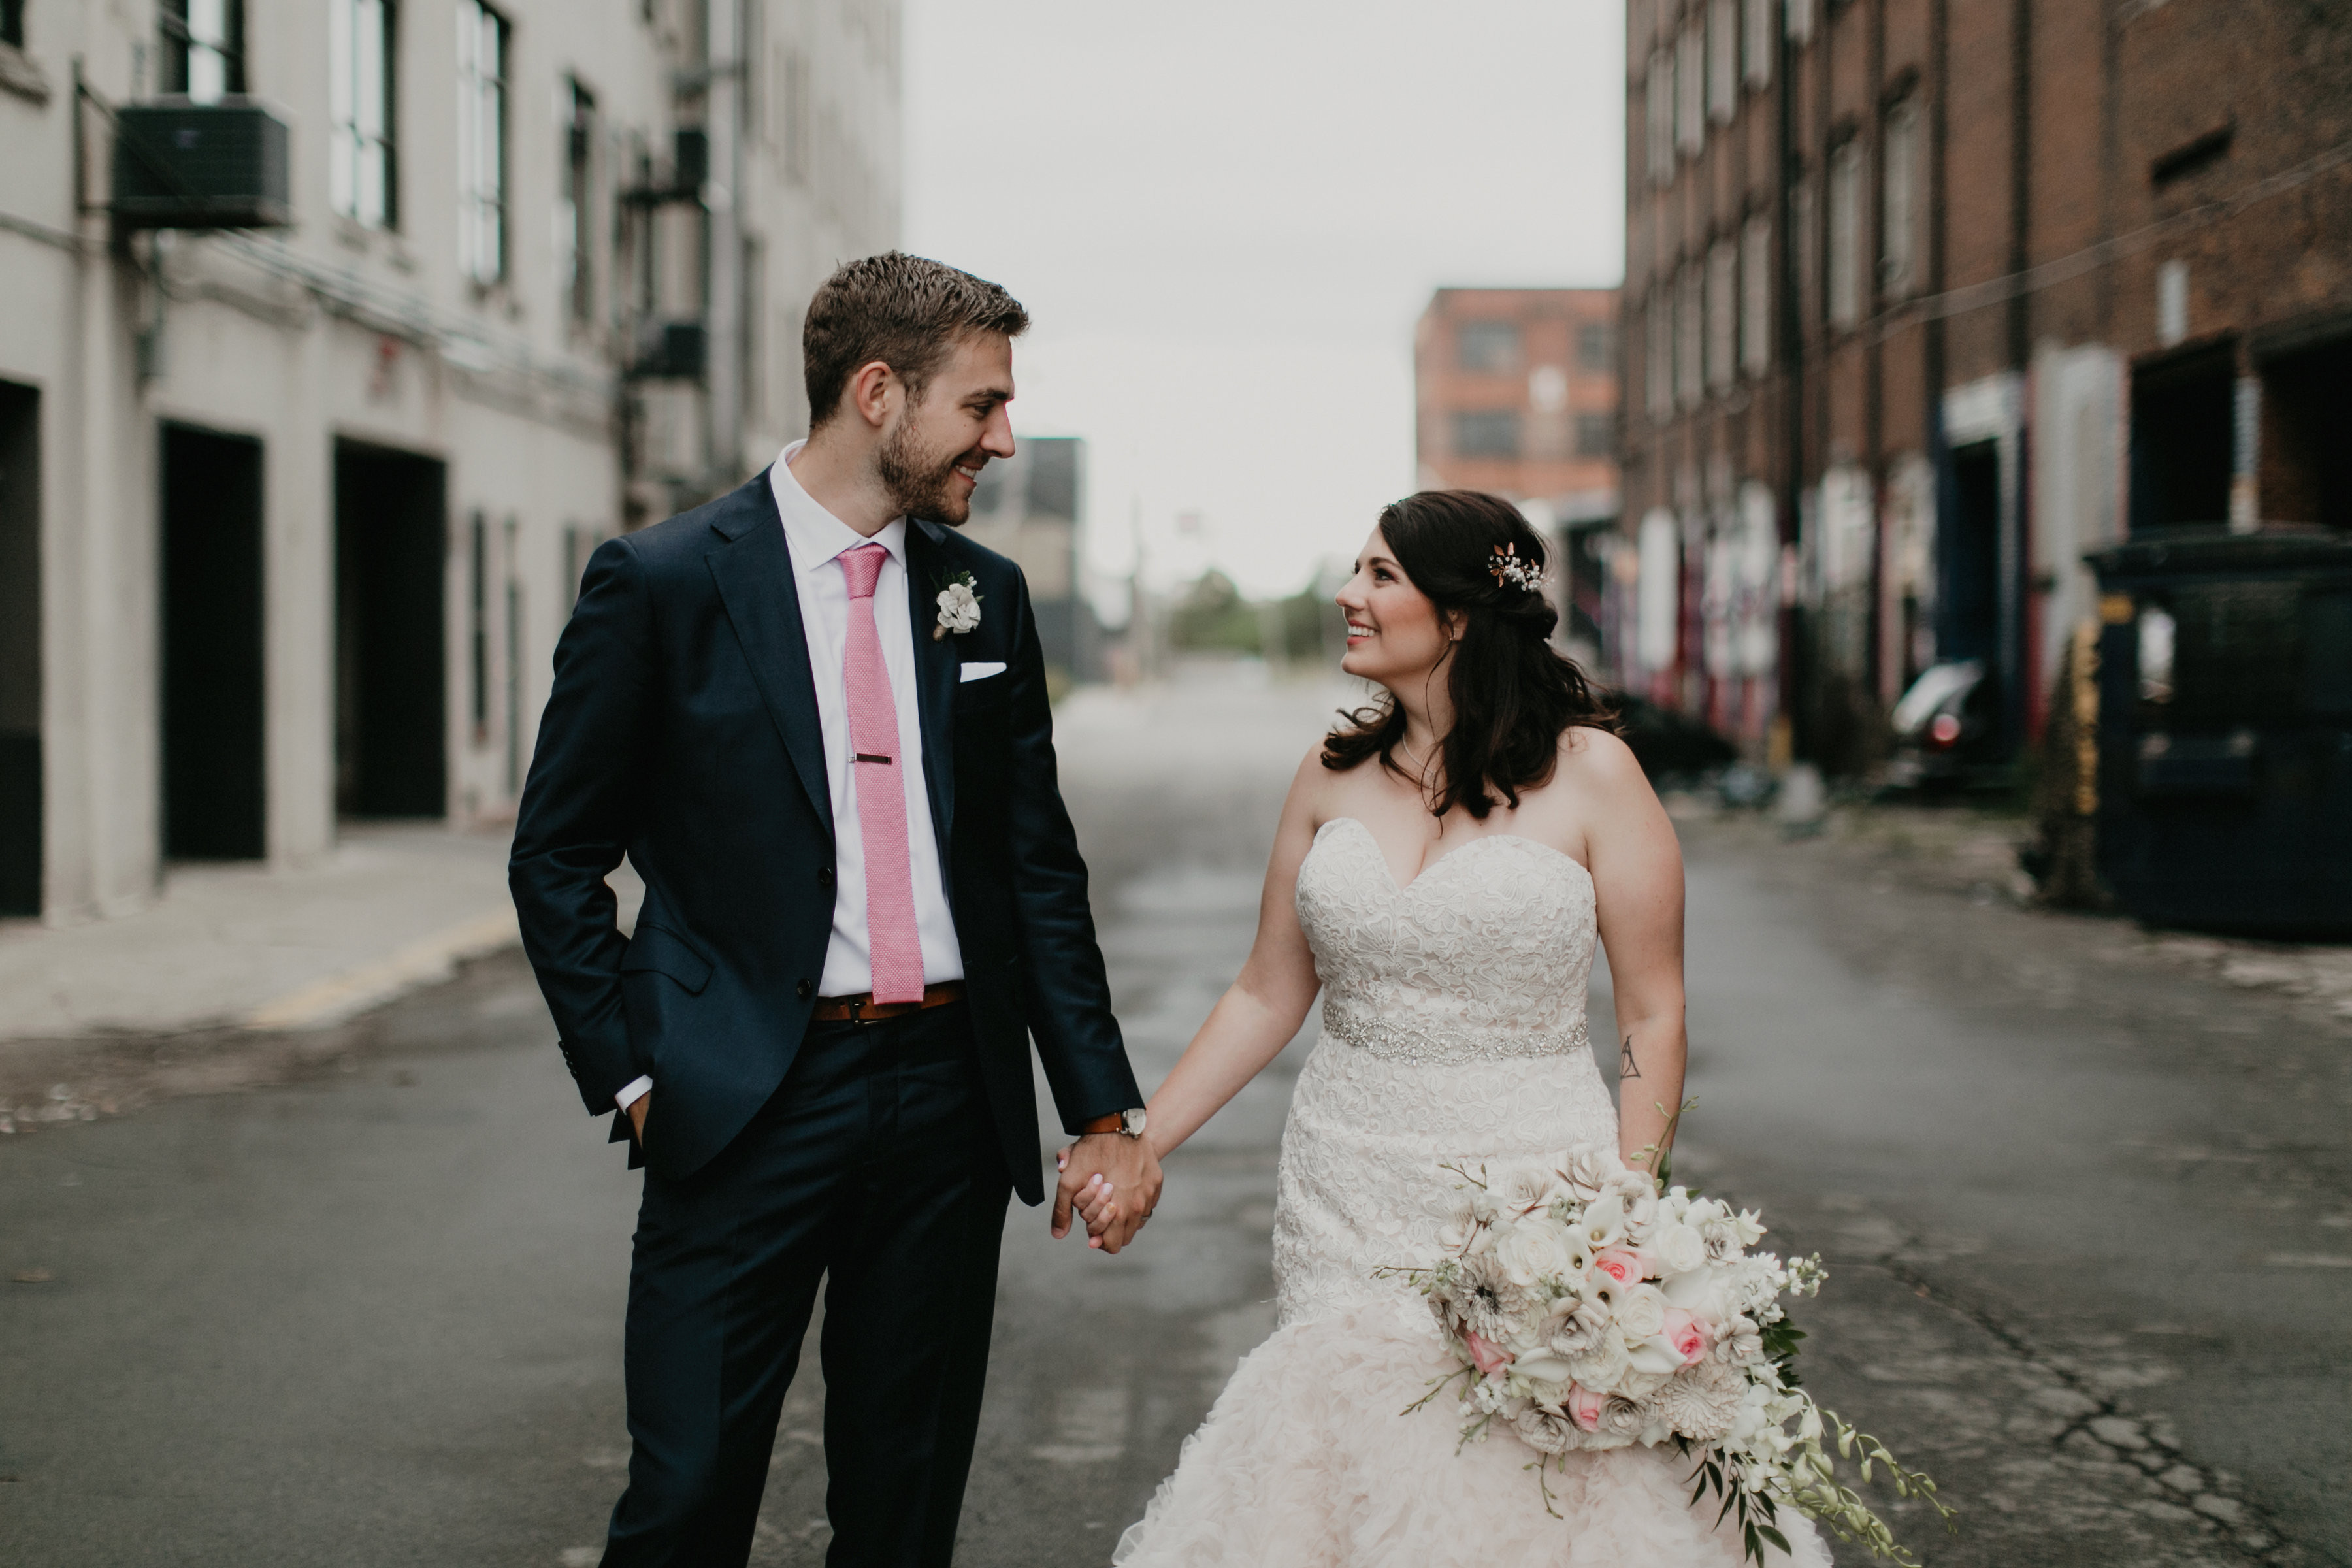 2022 Wedding Wait List